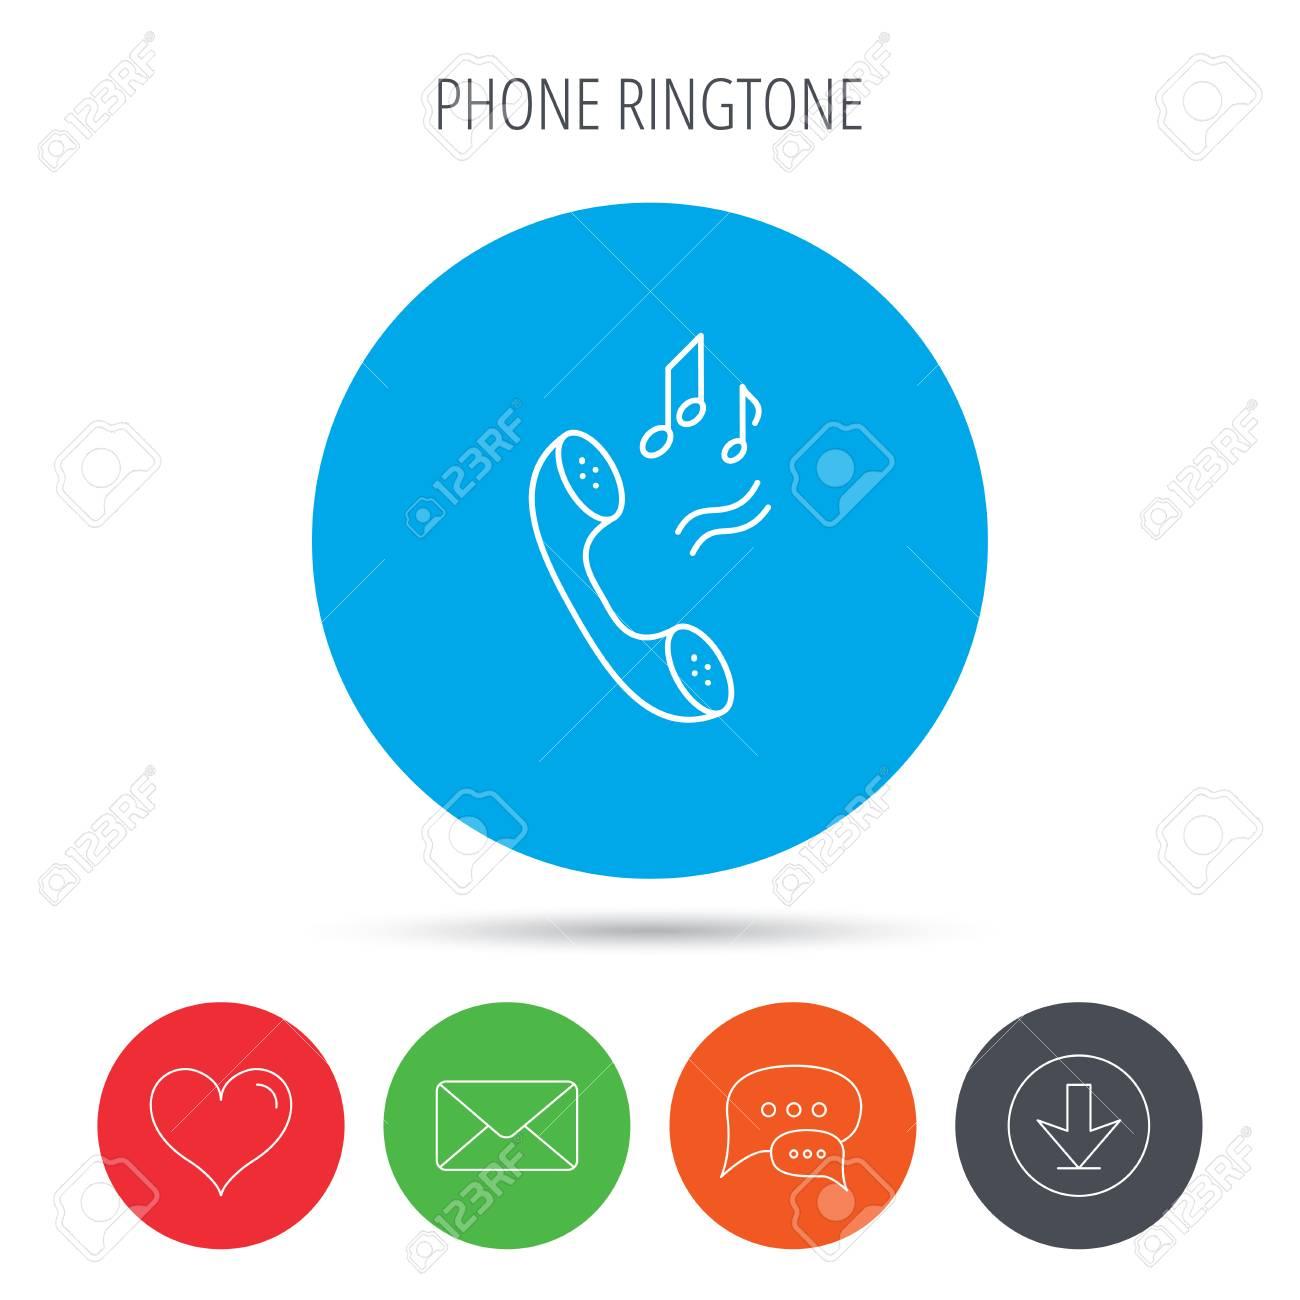 Mail ringtone free download.